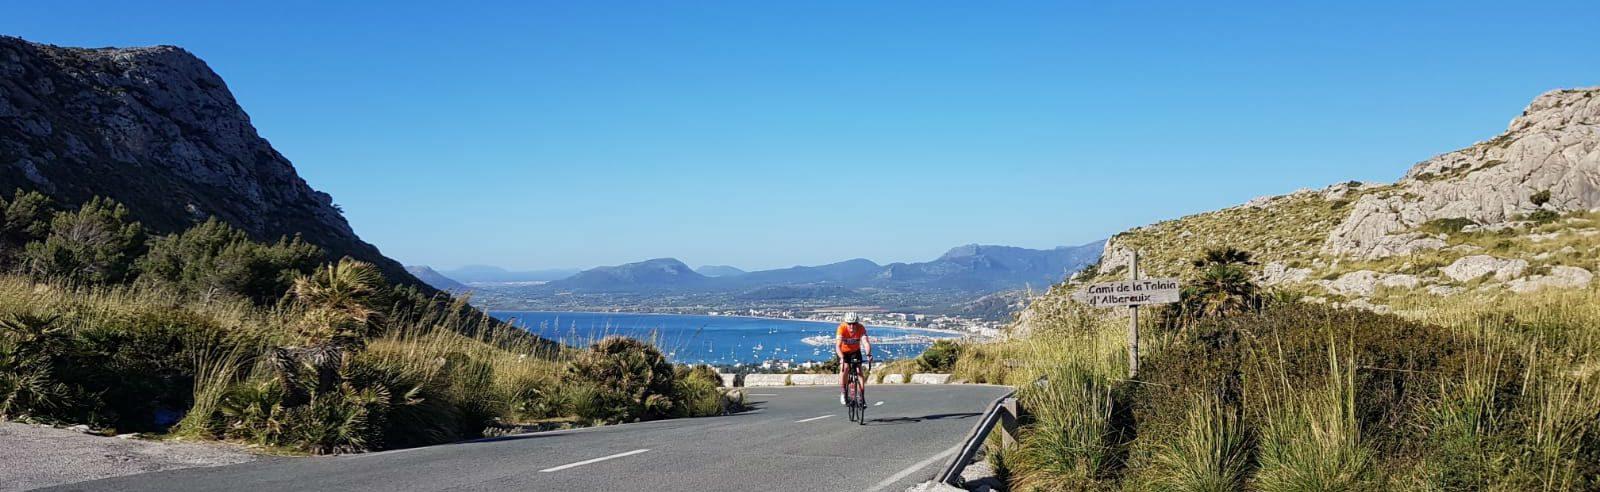 Cap De Formentor Bike Ride in Mallorca